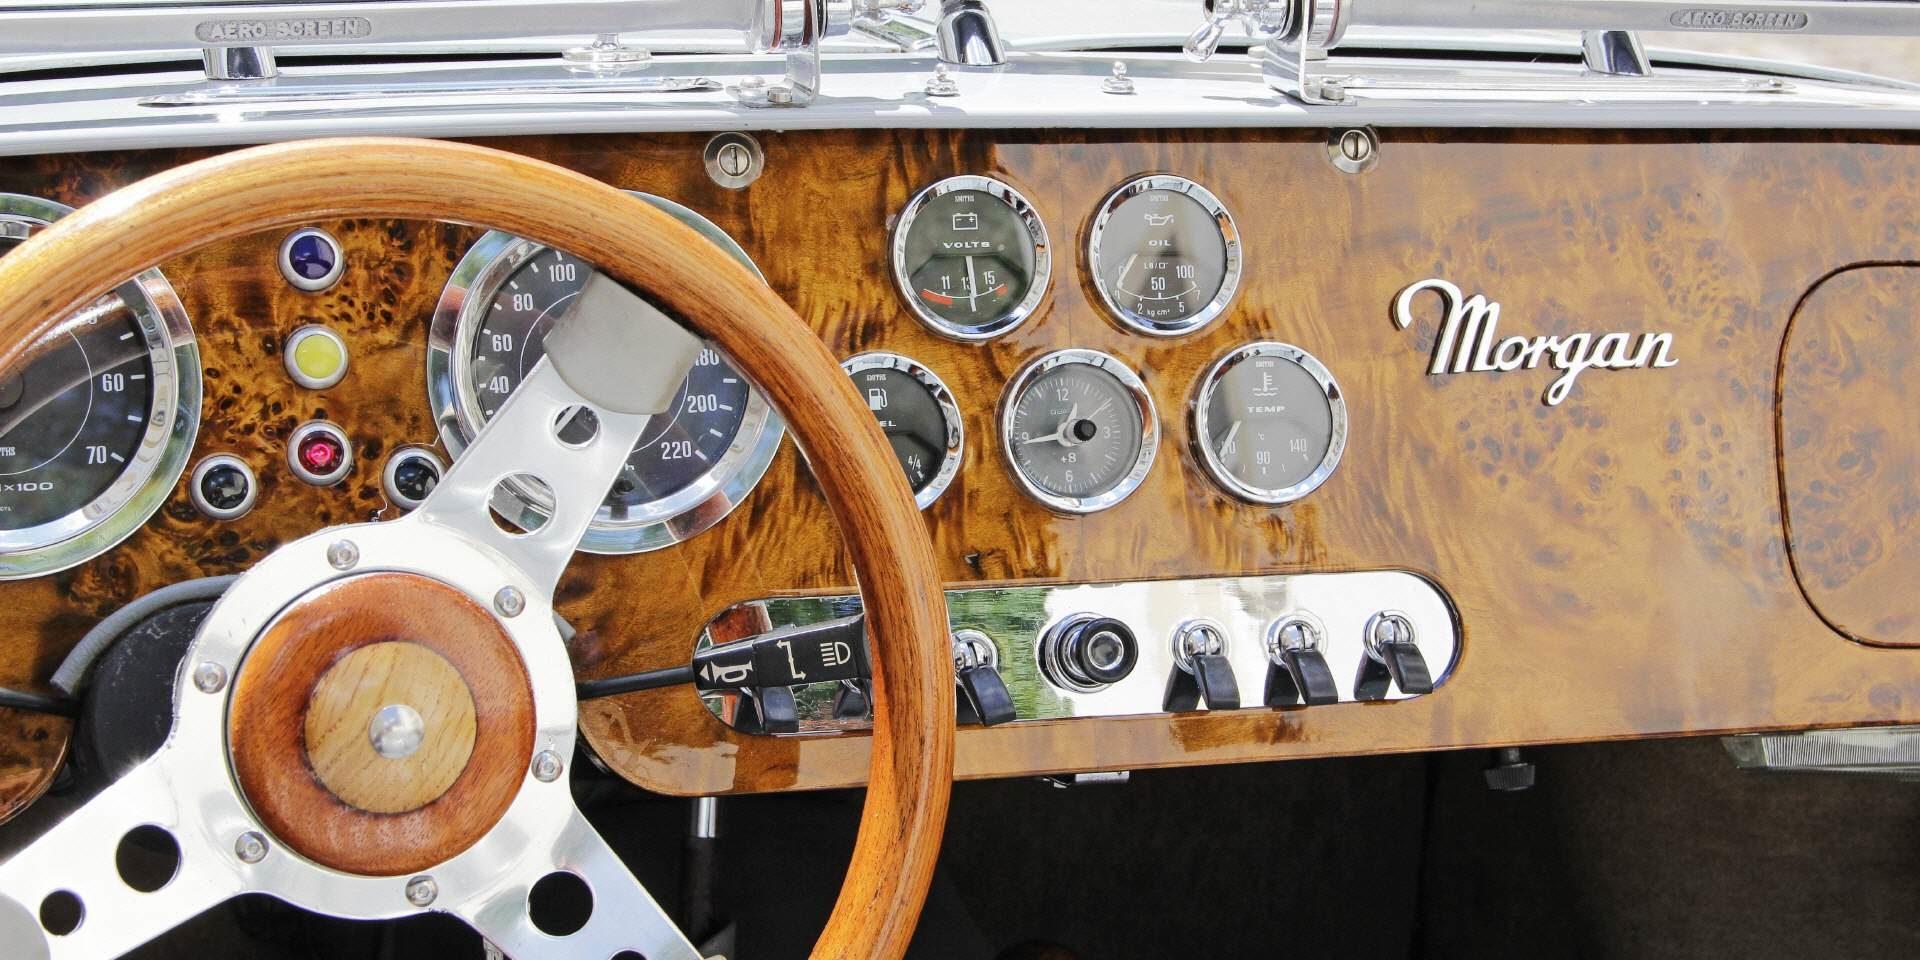 Oldtimer Morgan mit Mahagoniholz-Cockpit